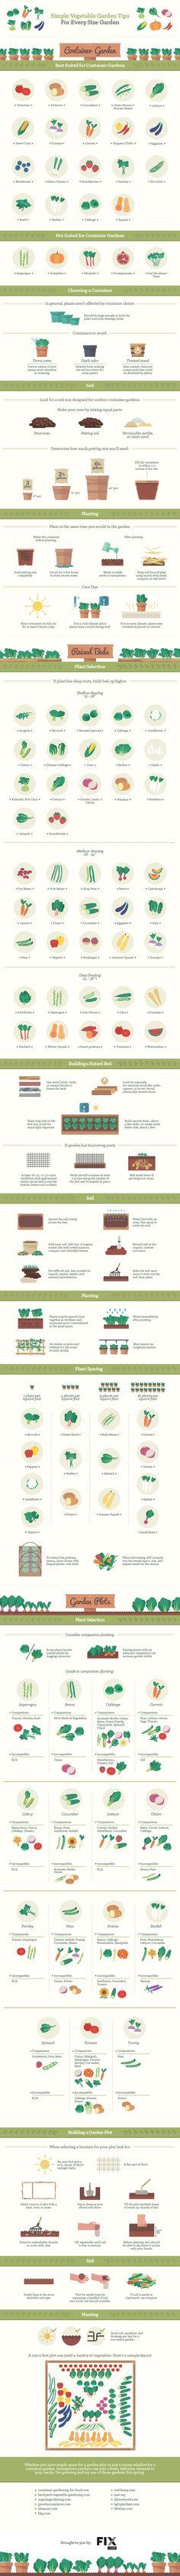 Simple Vegetable Gardening Basics for Every Size Garden